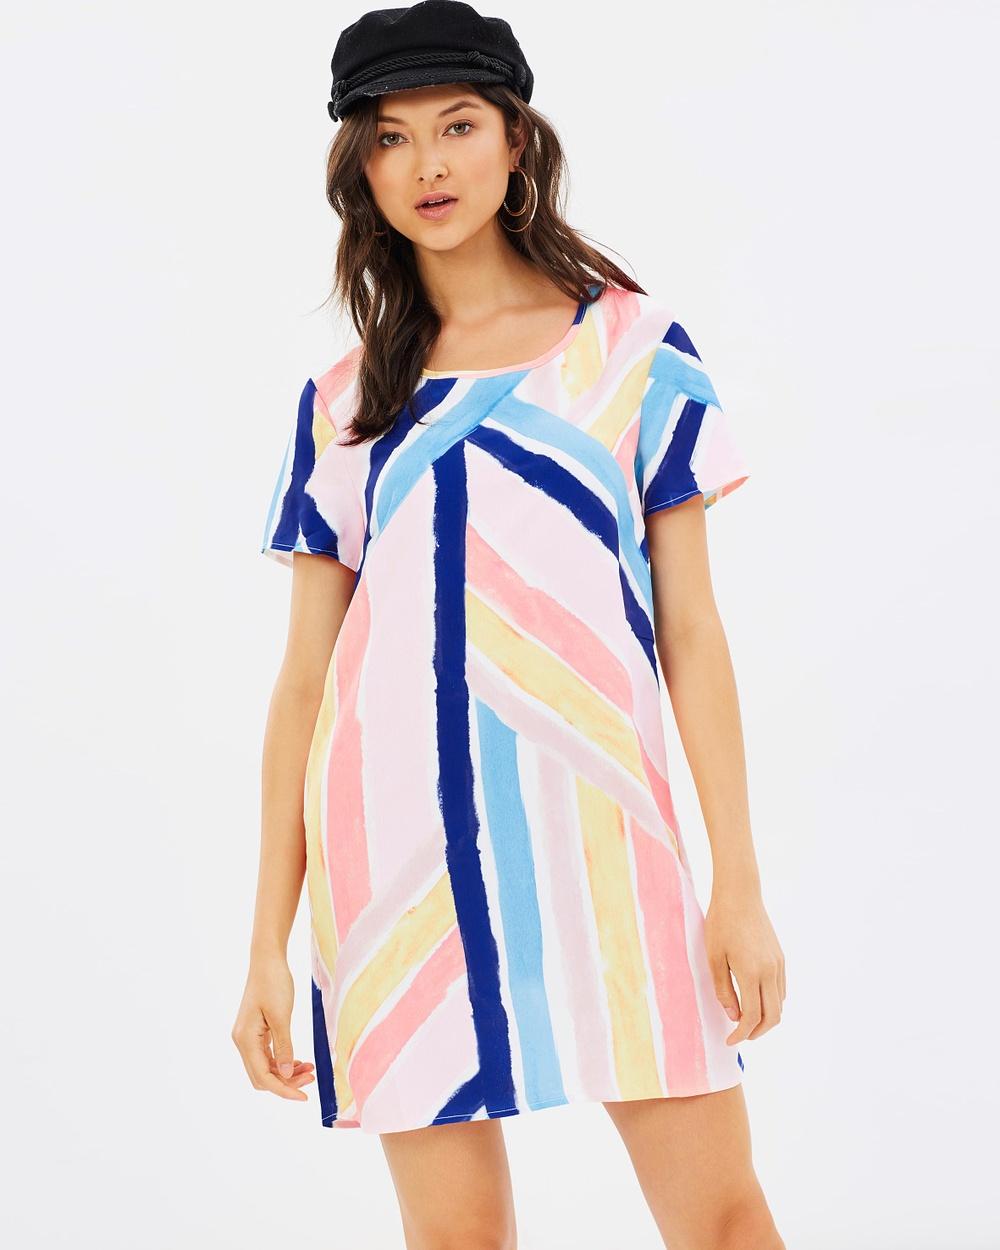 MINKPINK Mara T Shirt Dress Printed Dresses Multi Mara T-Shirt Dress